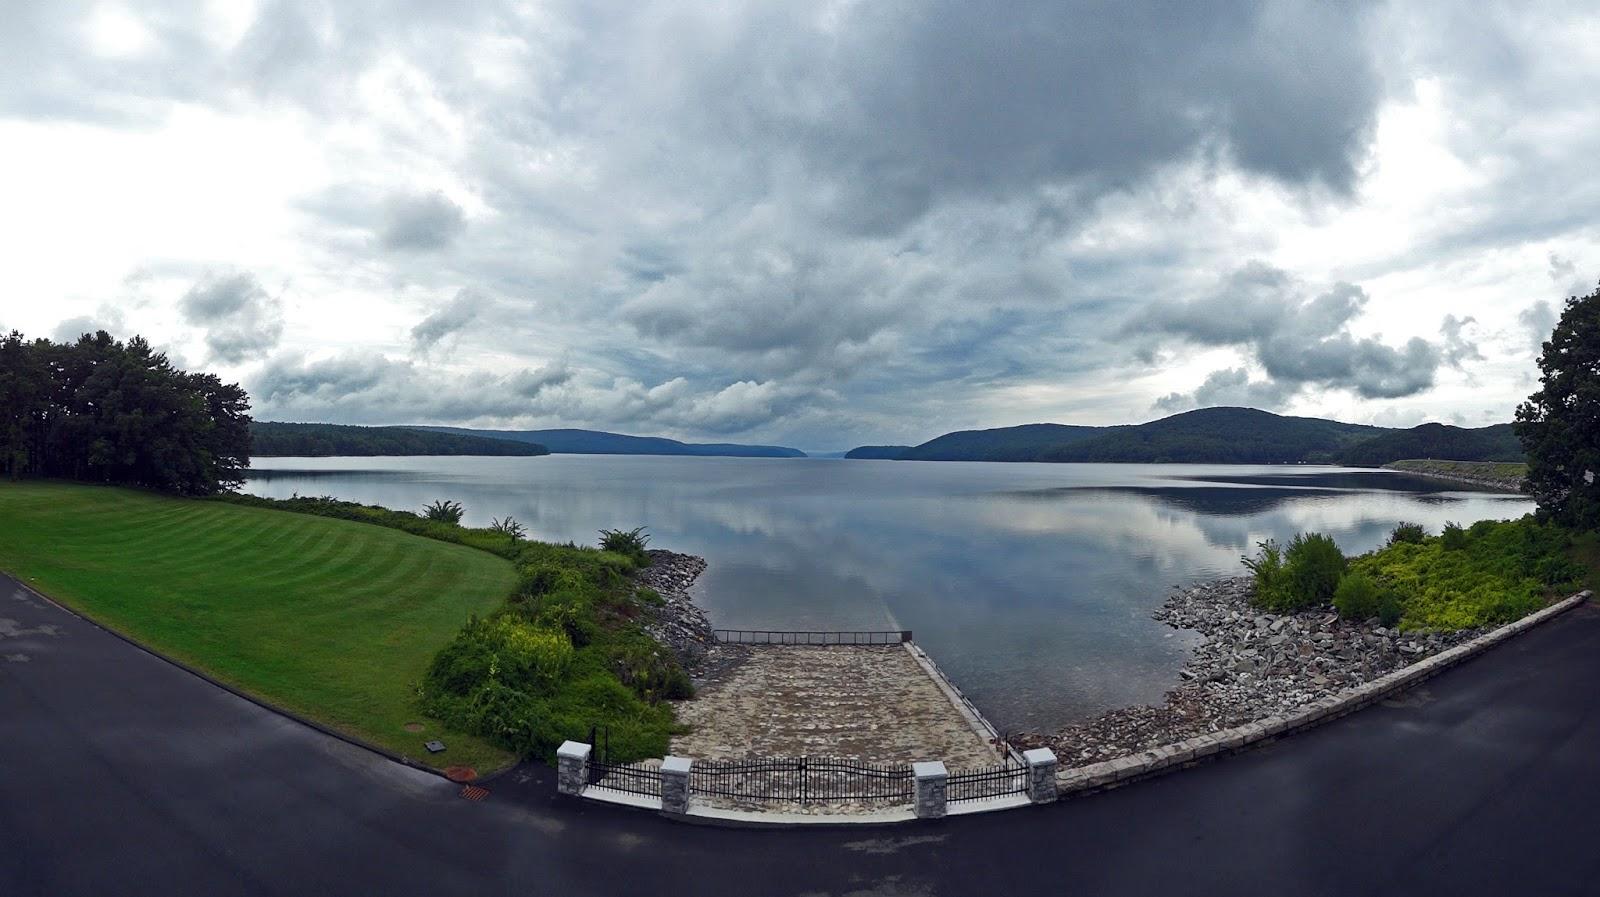 Joe S Retirement Blog Quabbin Reservoir Belchertown